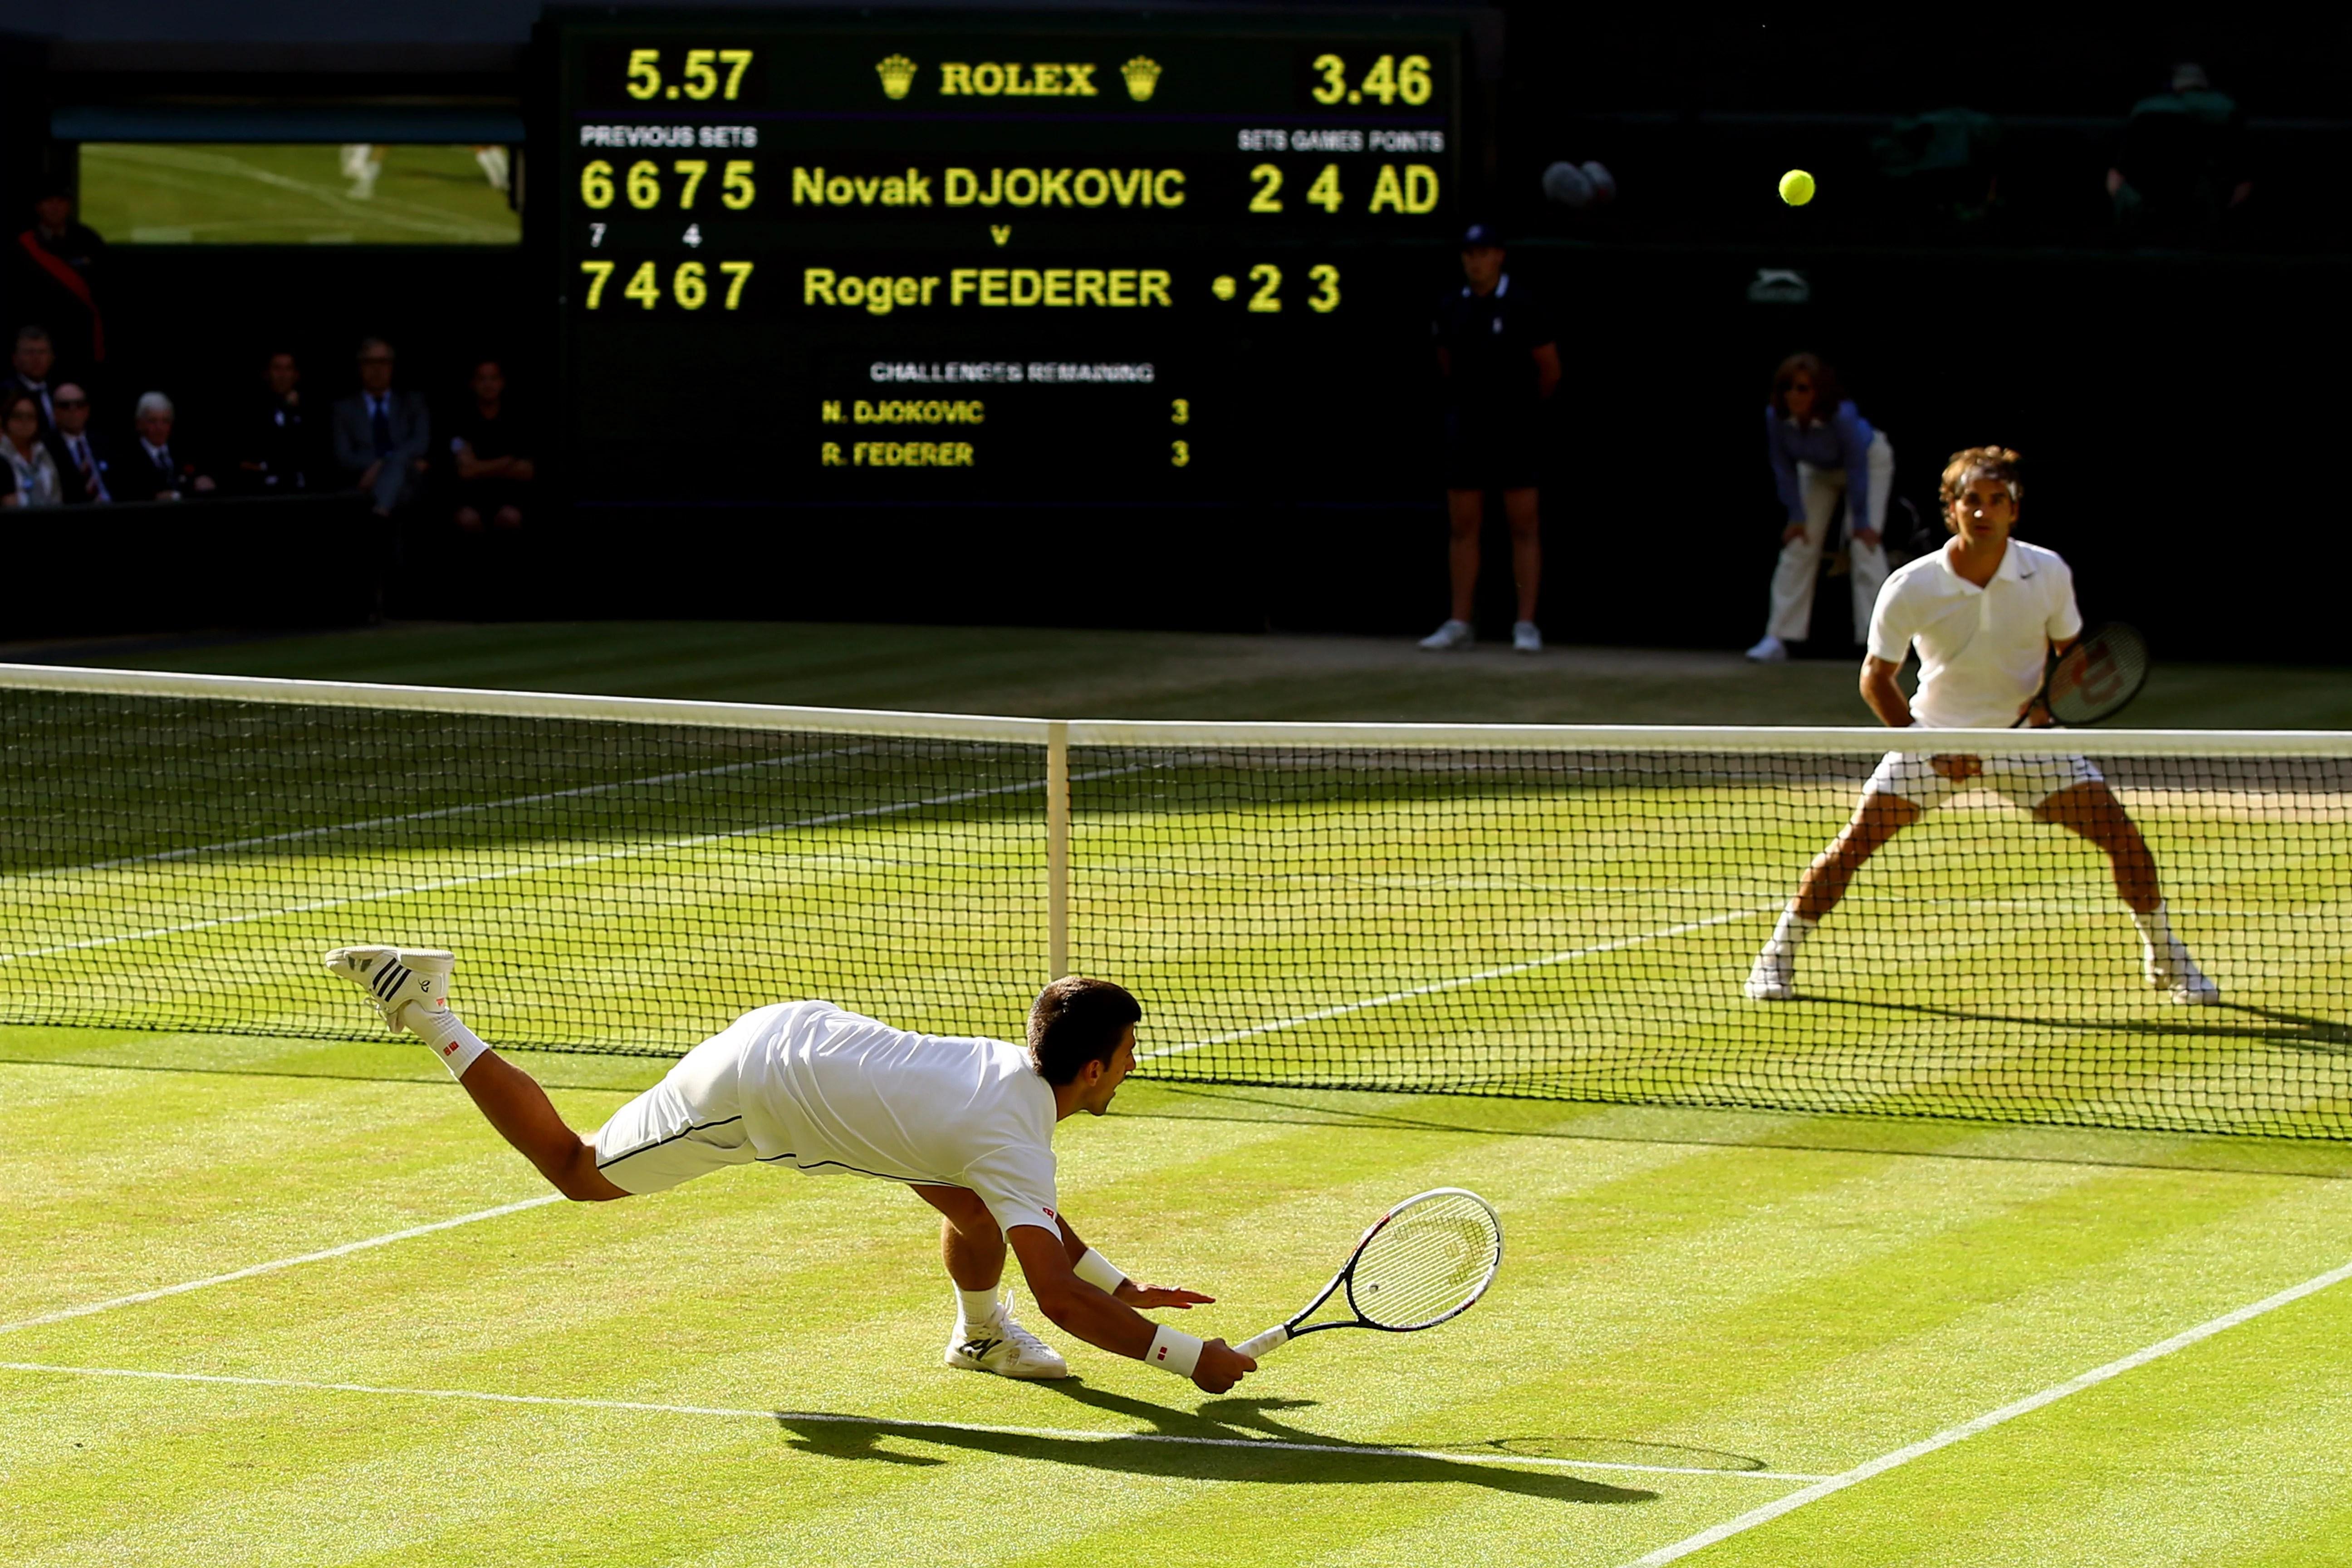 Novak Djokovic vs Roger Federer Live score and regular updates from Wimbledon 2015 mens final